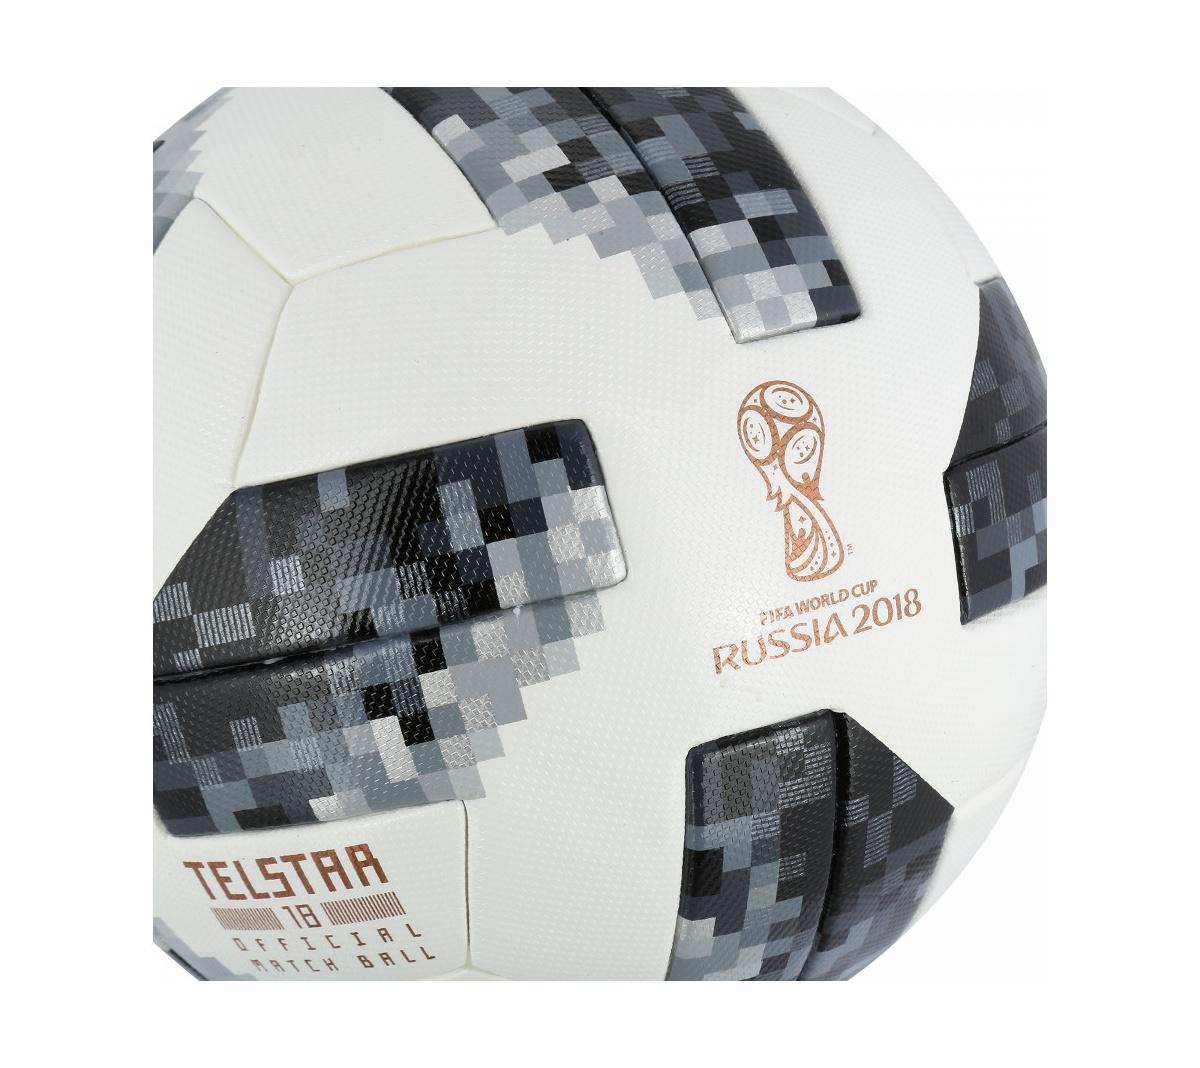 Bola de Futebol de Campo Telstar Oficial Copa do Mundo FIFA 2018 adidas OMB